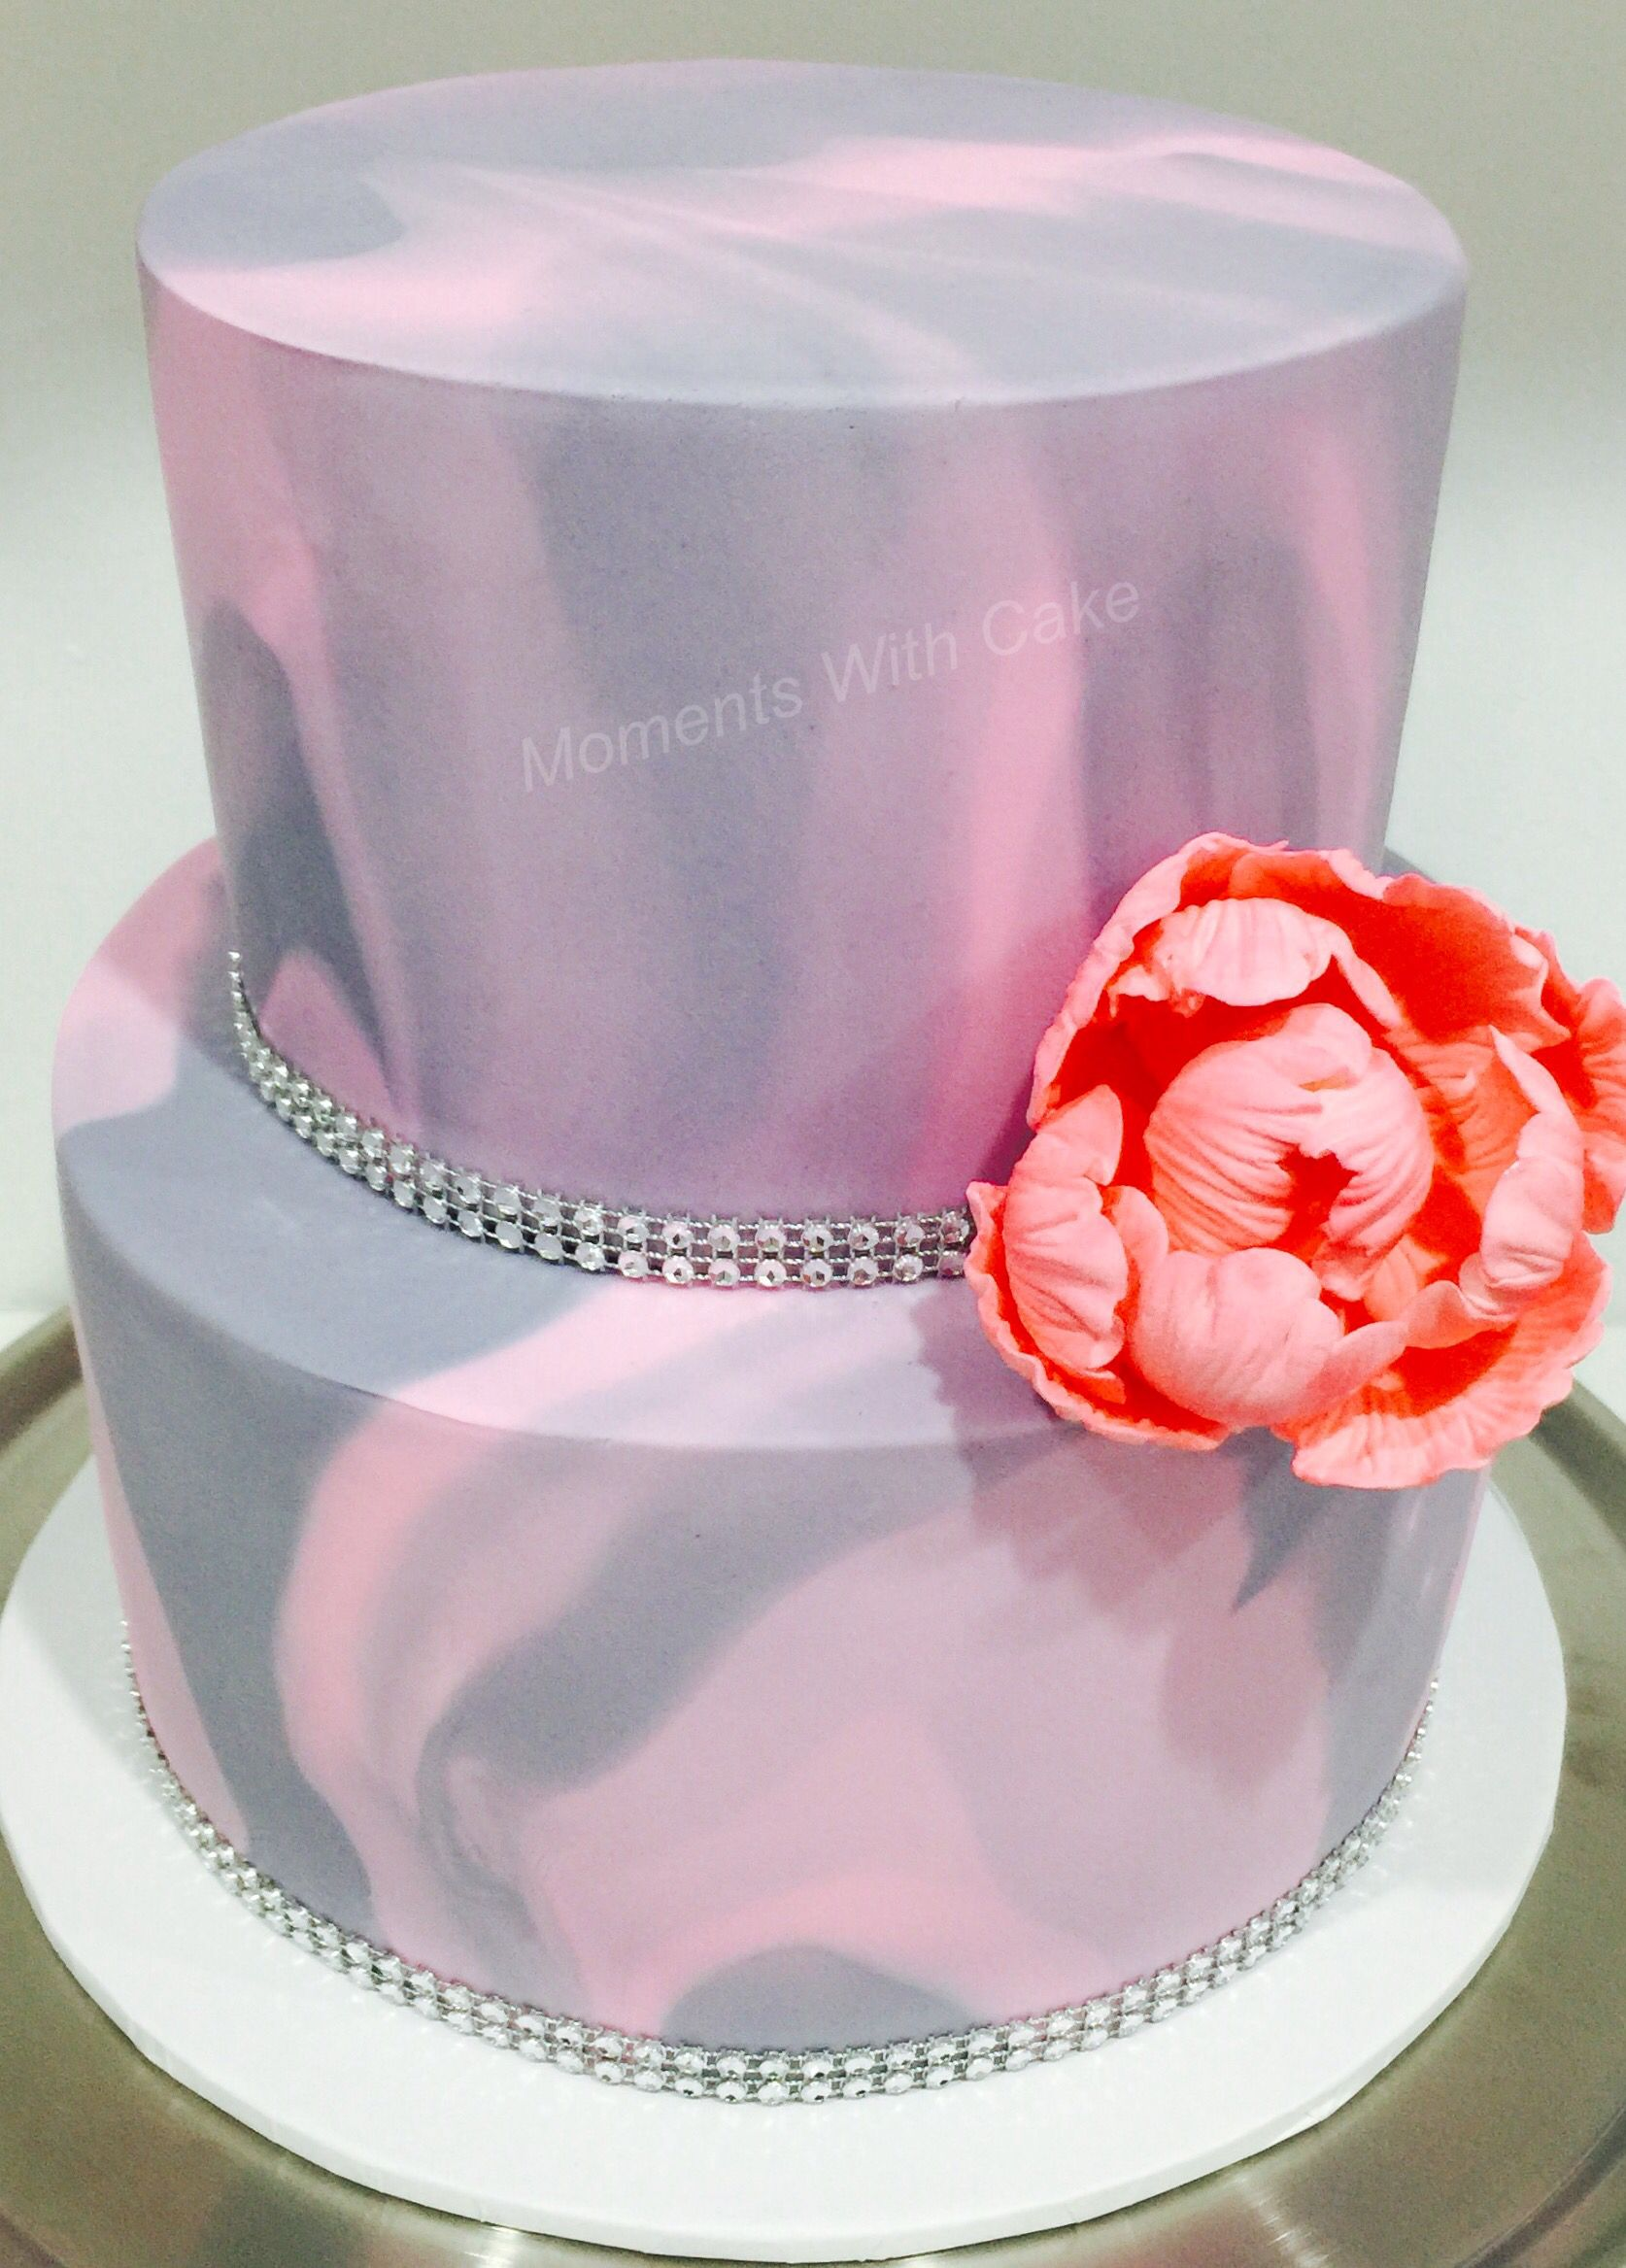 Light Pink And Grey Marble Fondant Wedding Cake